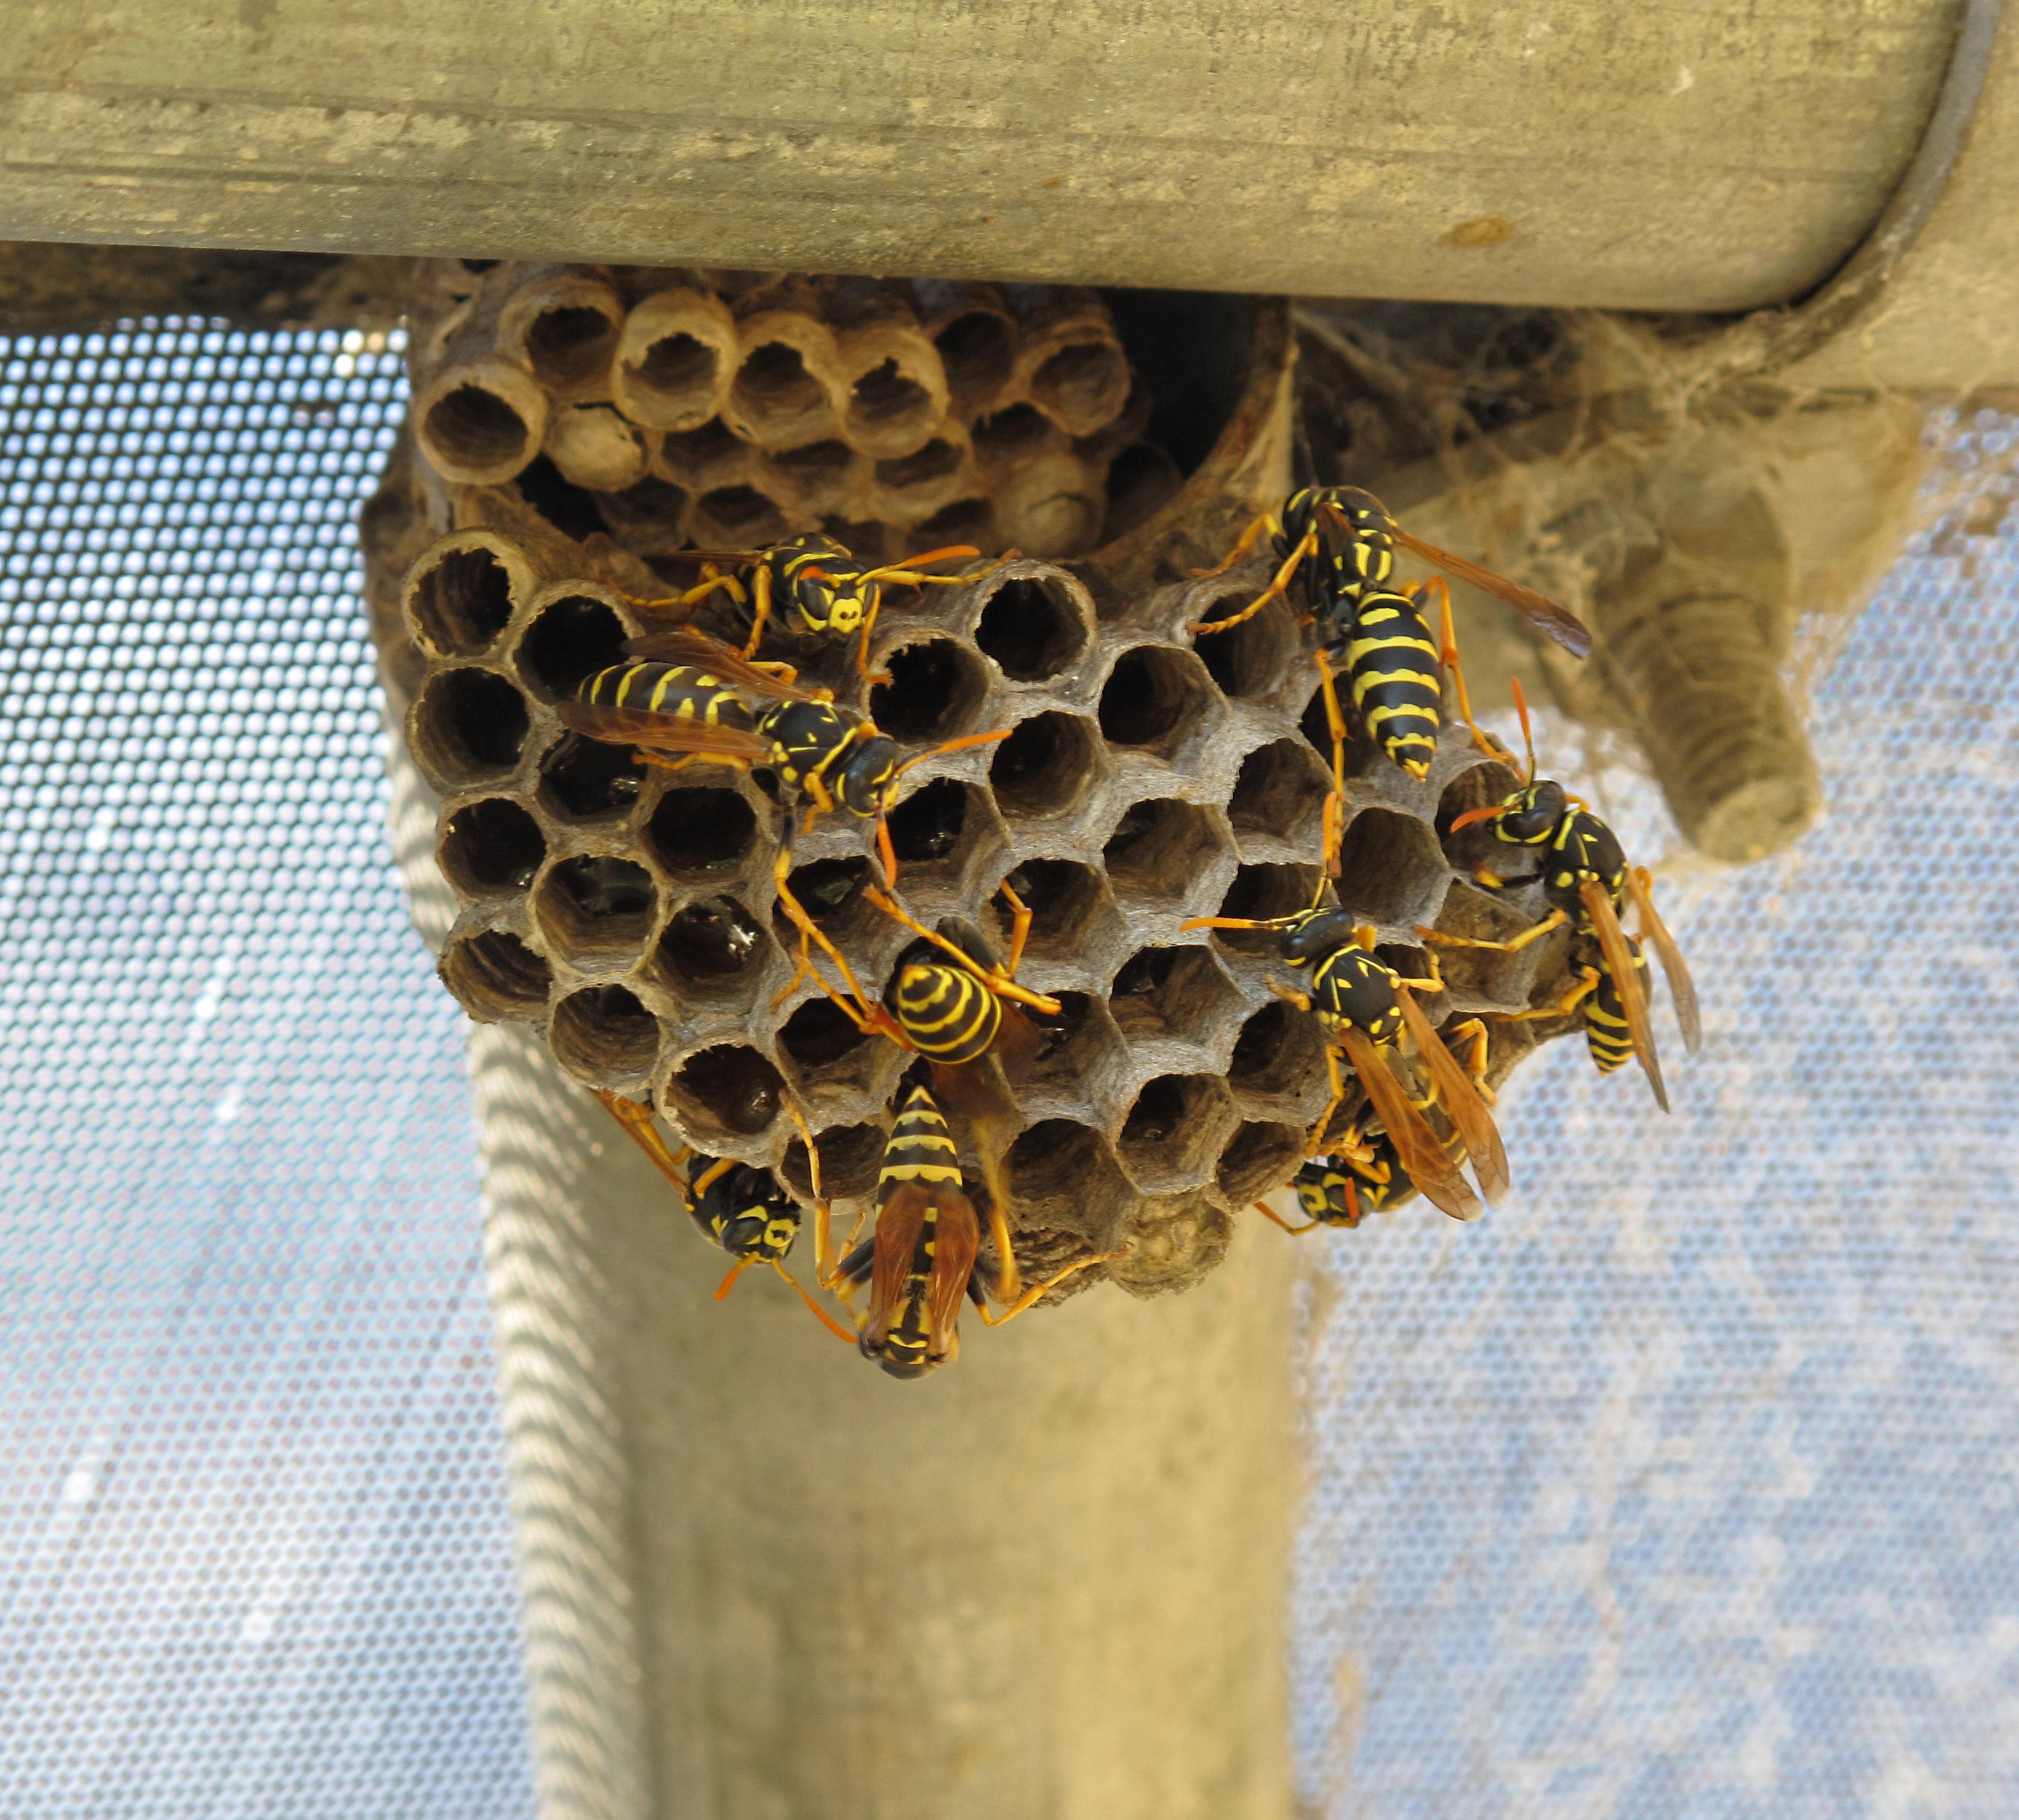 File:Paper wasps and nest.jpgWikimedia Commons